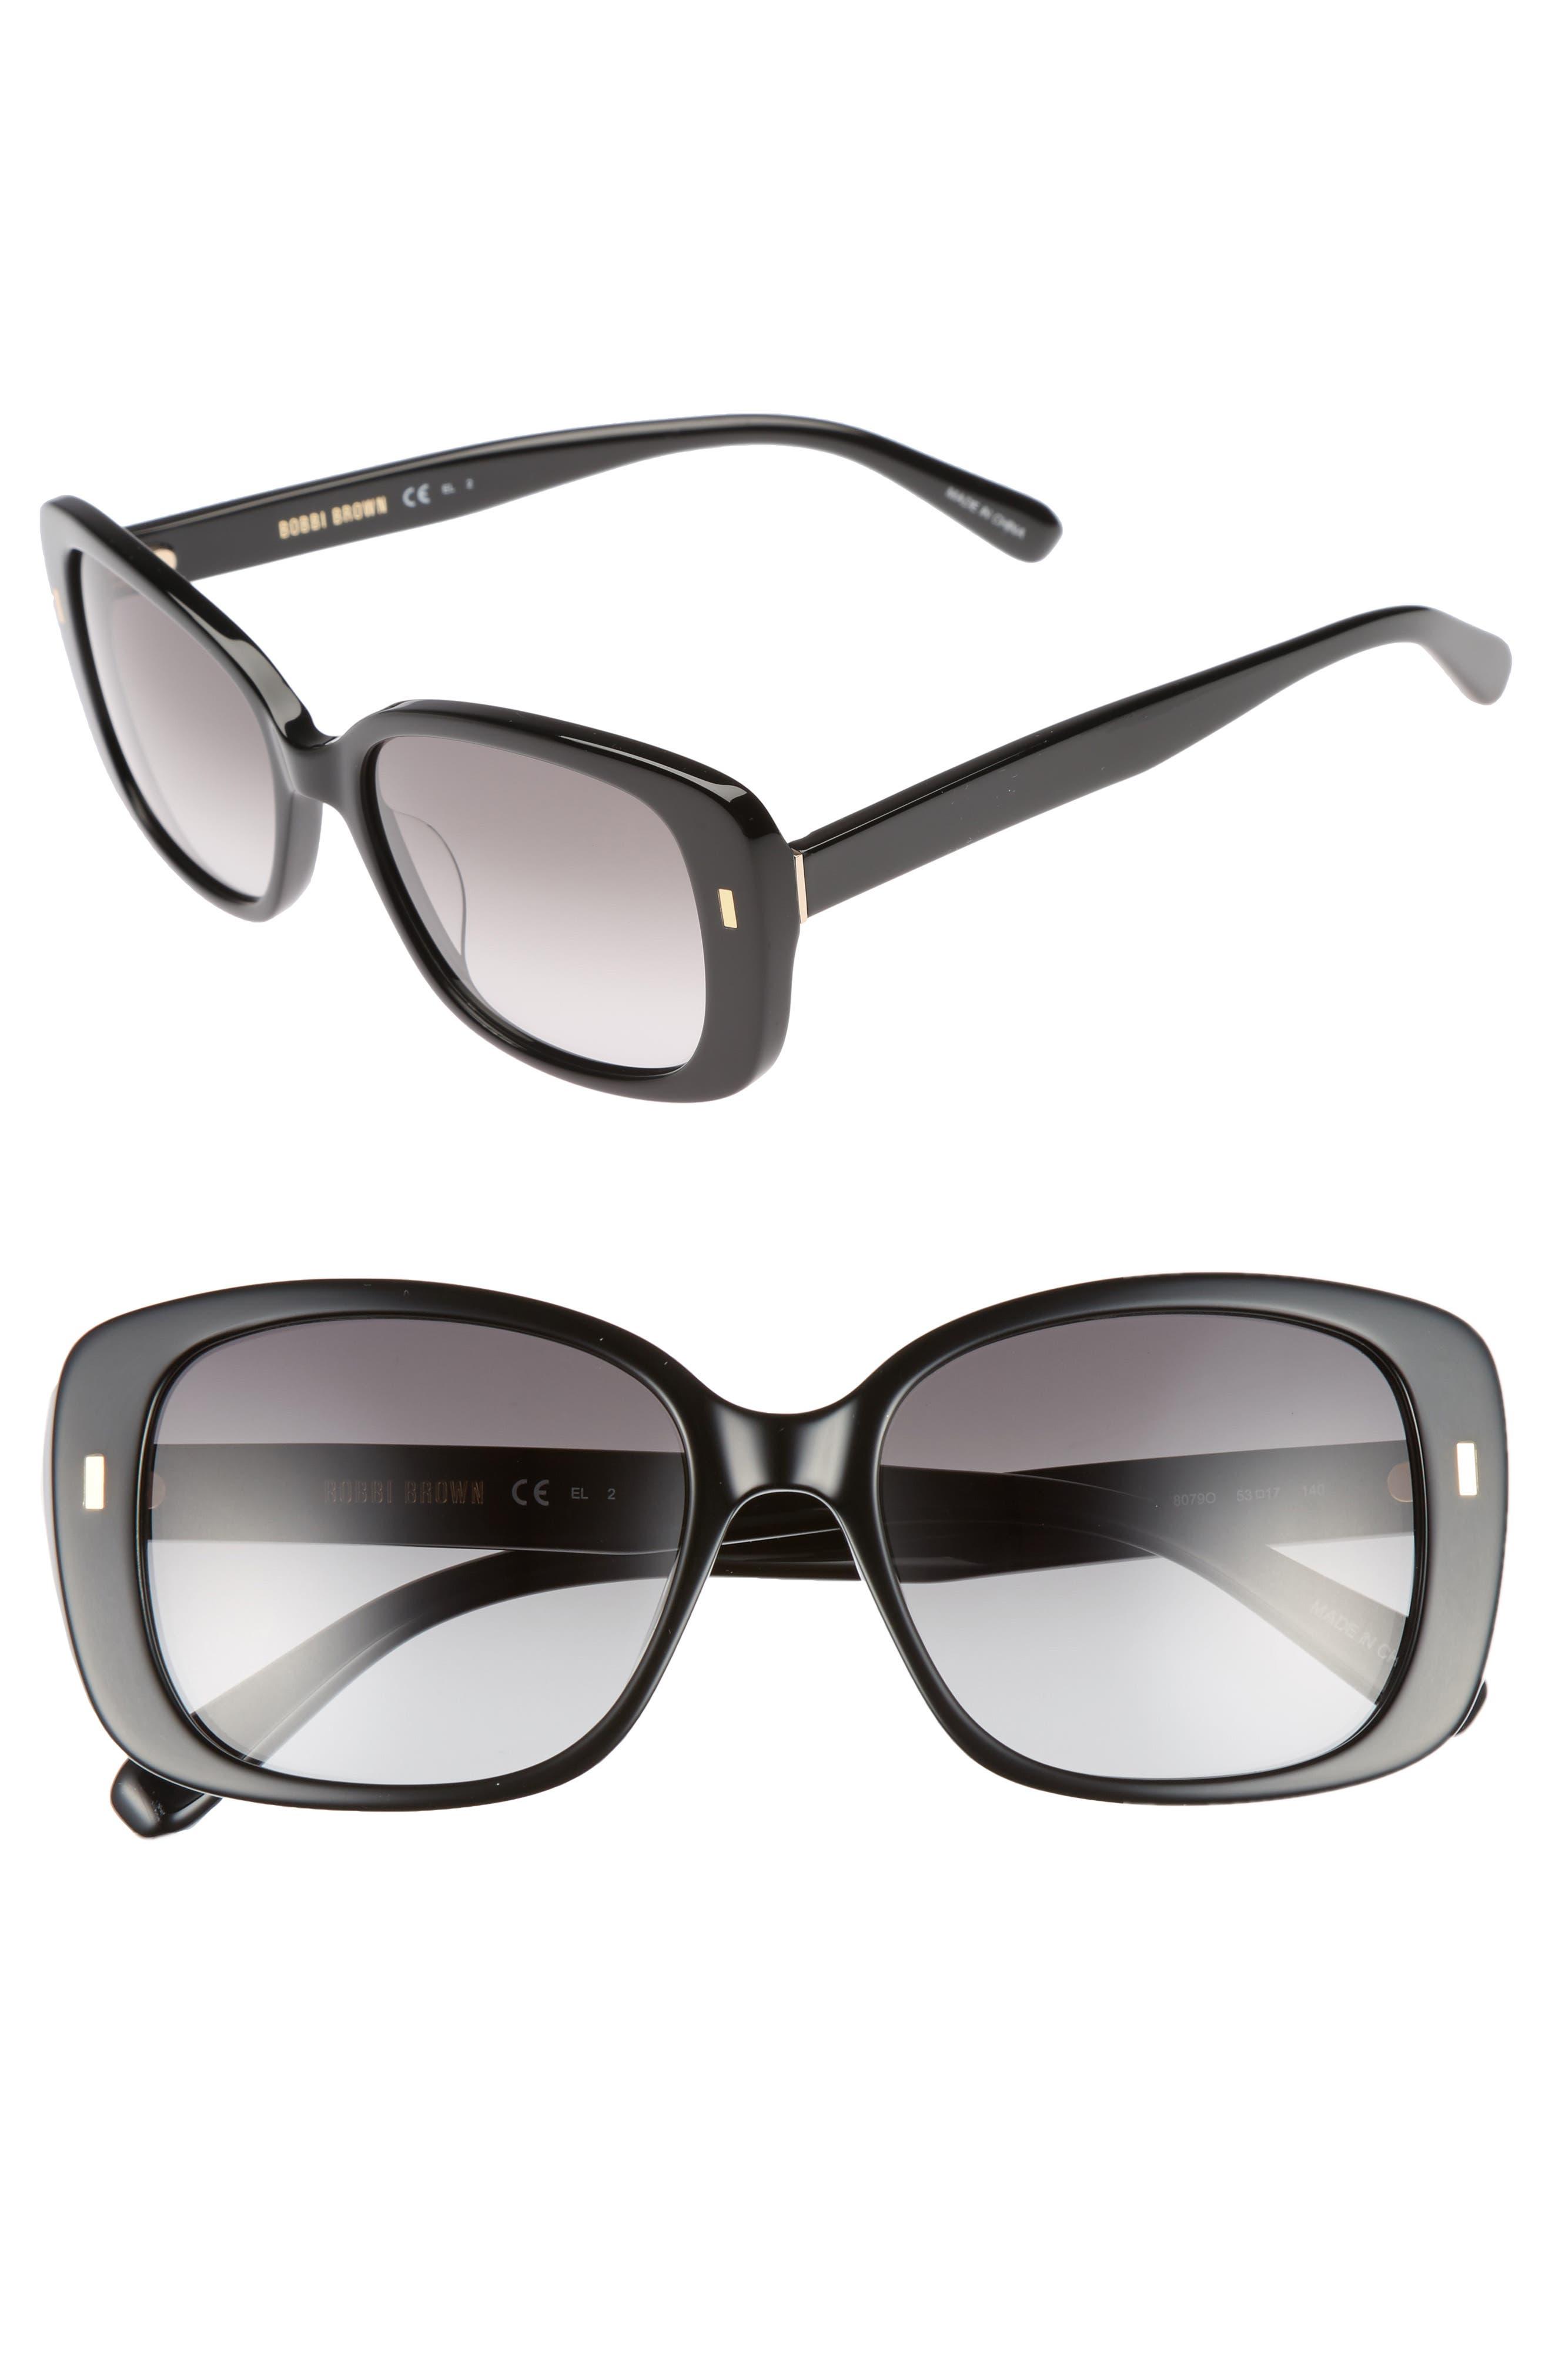 Bobbi Brown The Audrey 53mm Square Sunglasses